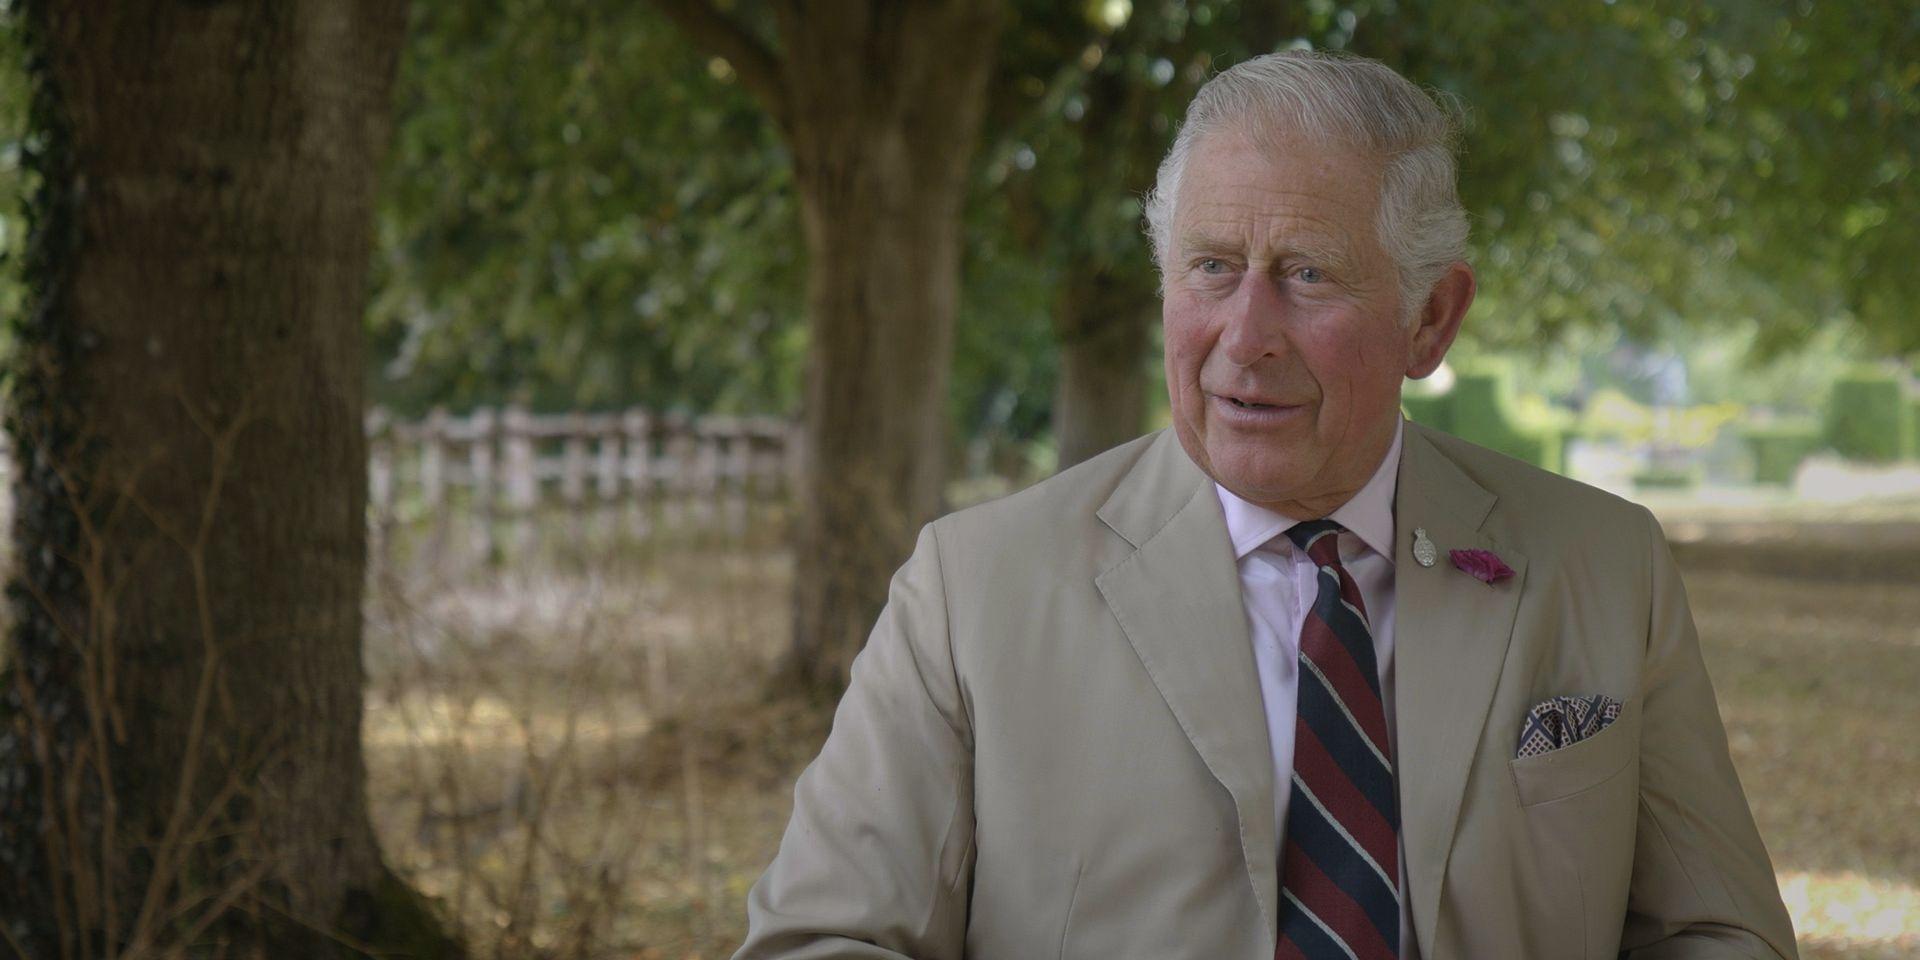 Prince Charles BBC documentary